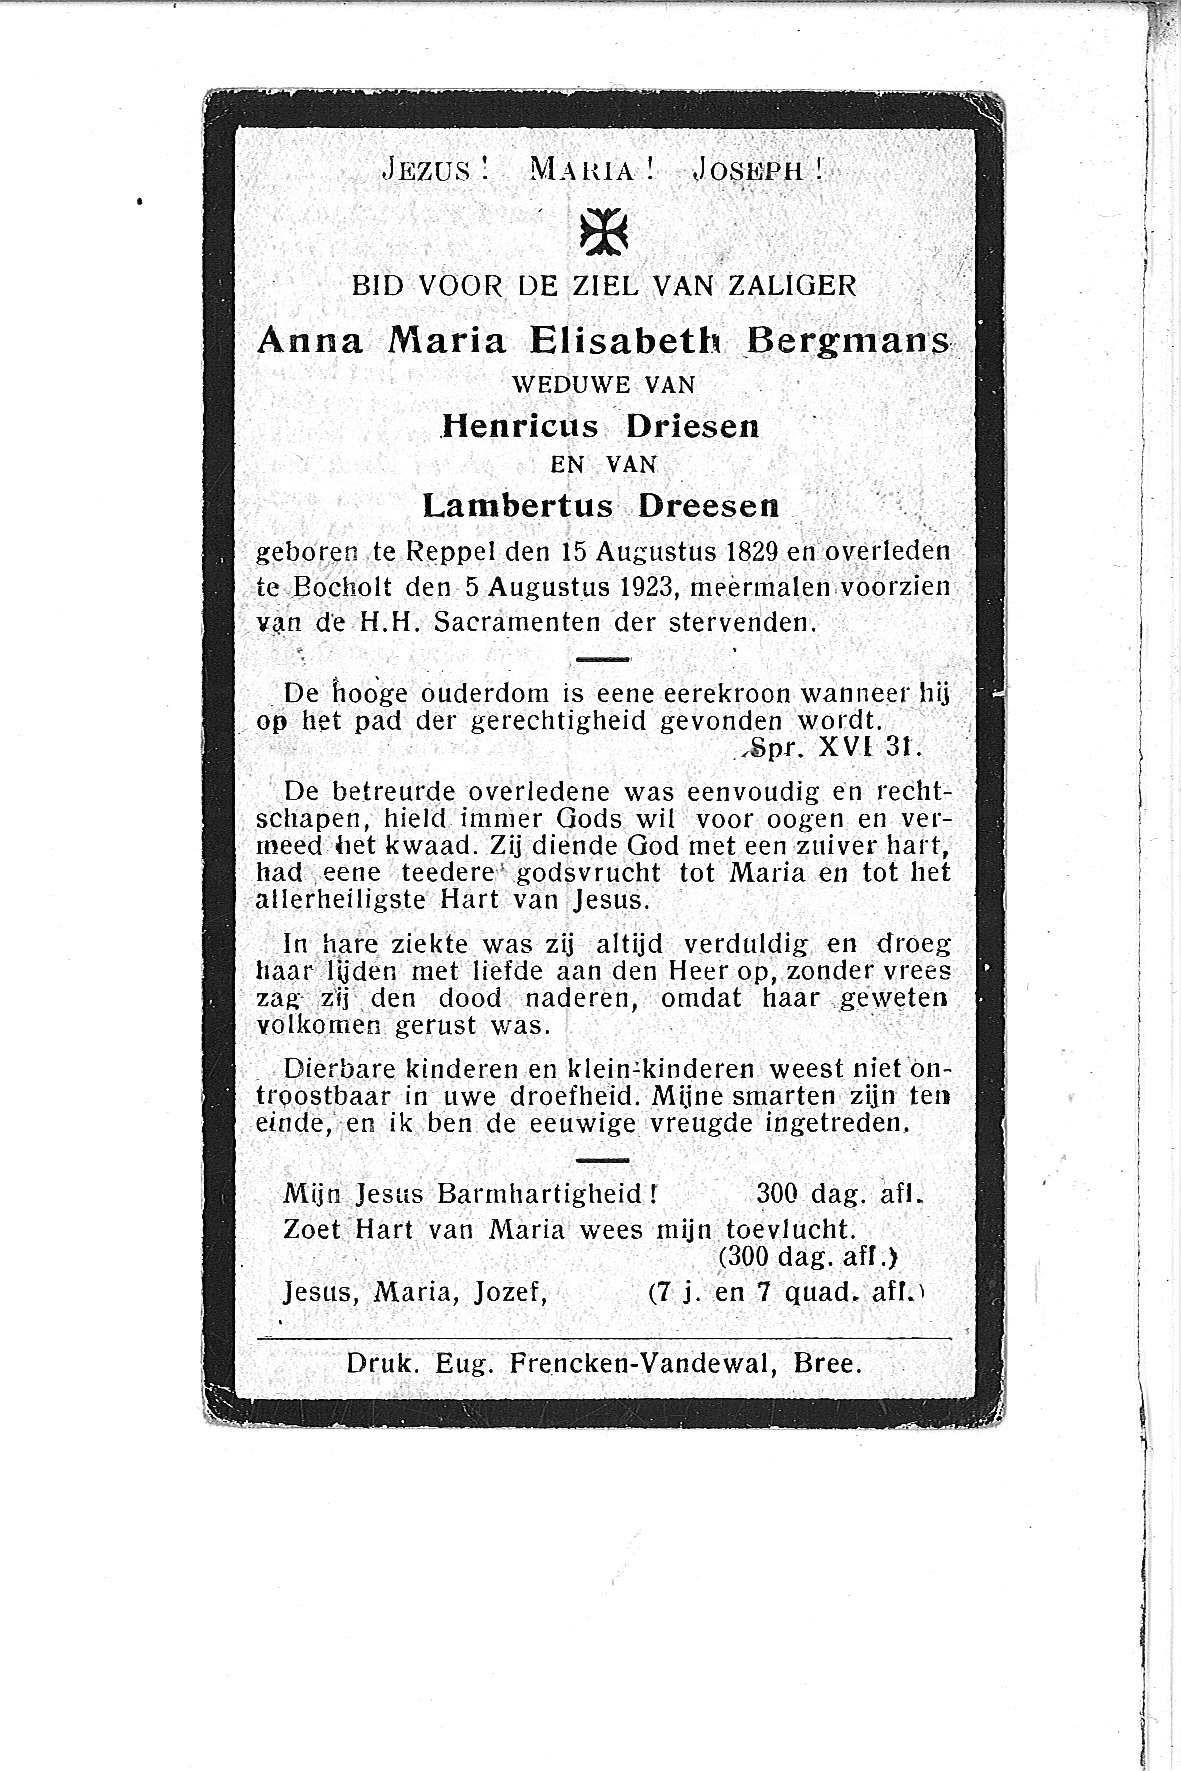 Anna-Maria-Elisabeth(1923)20110113092136_00007.jpg